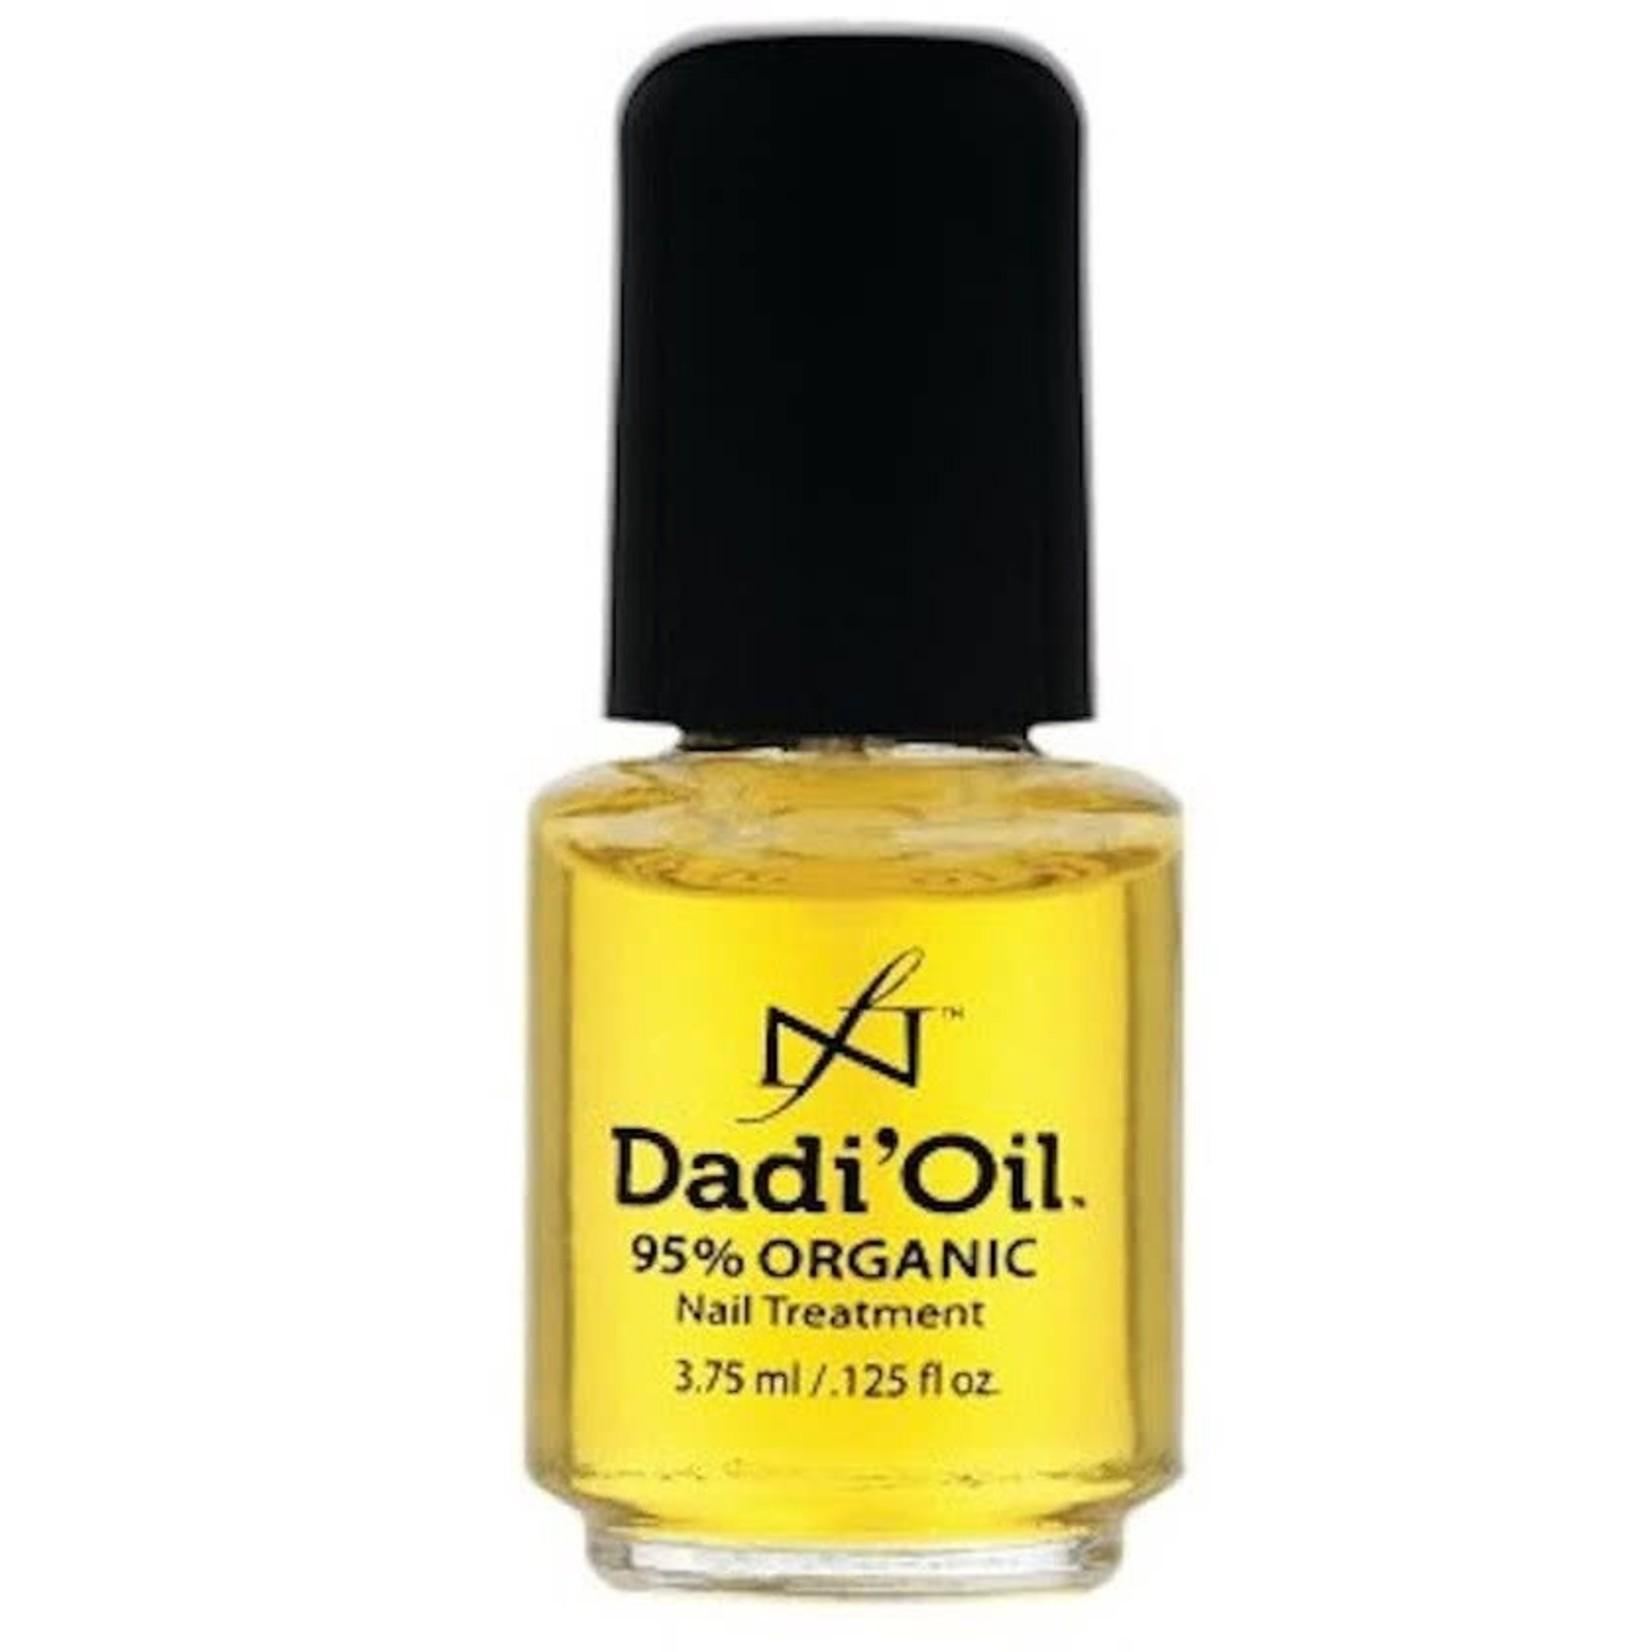 Dadi'Oil Dadi'Oil 3,75 ml